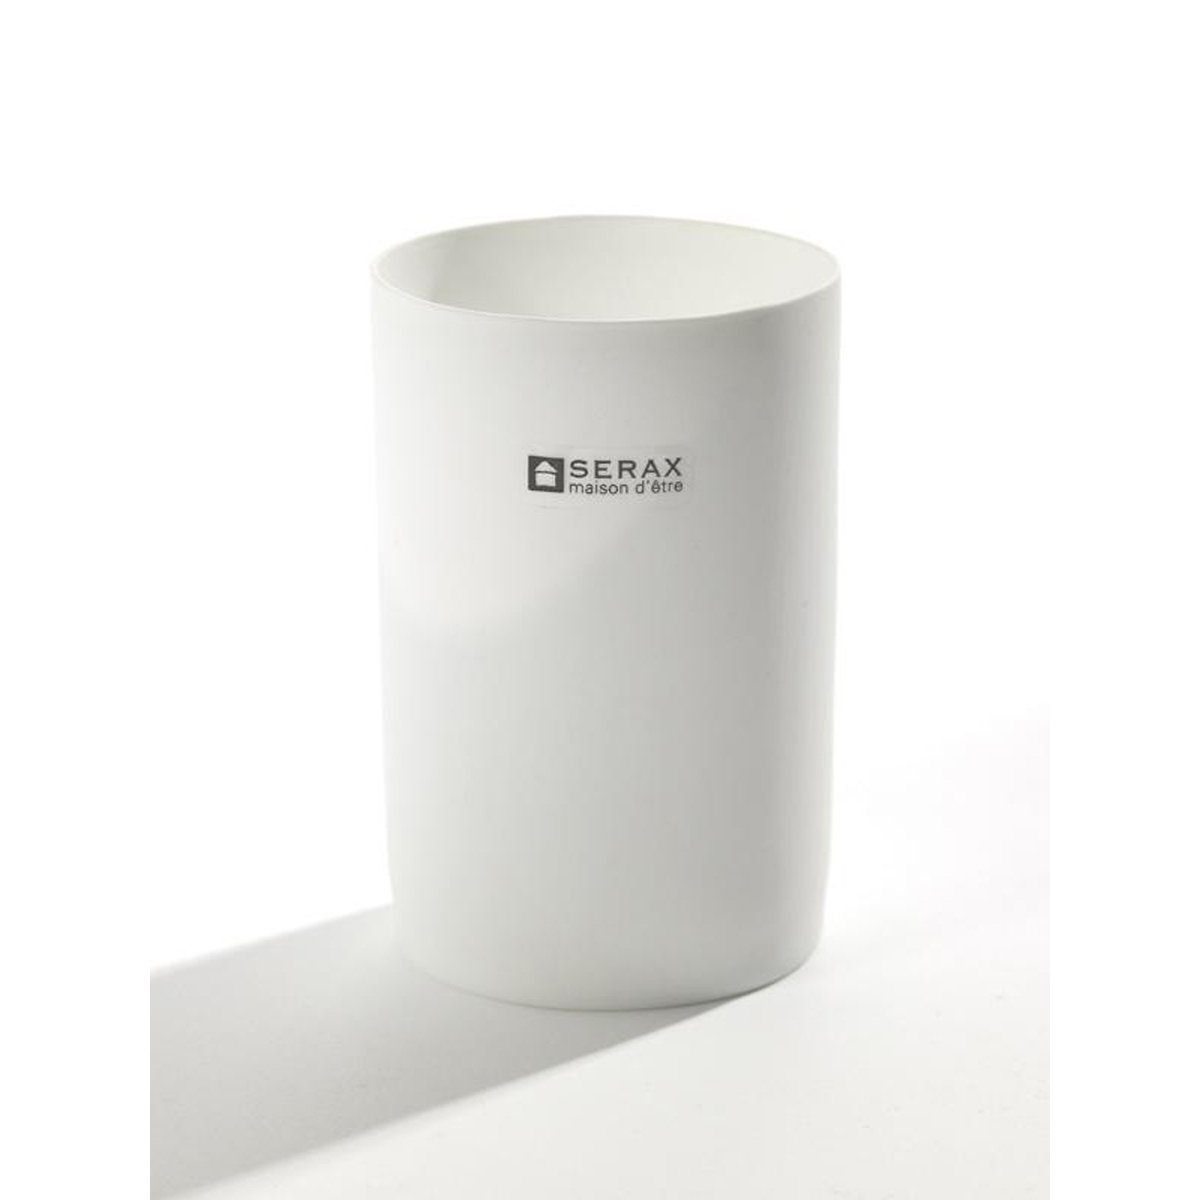 Serax Serax Teelichthalter Porzellan fein groß